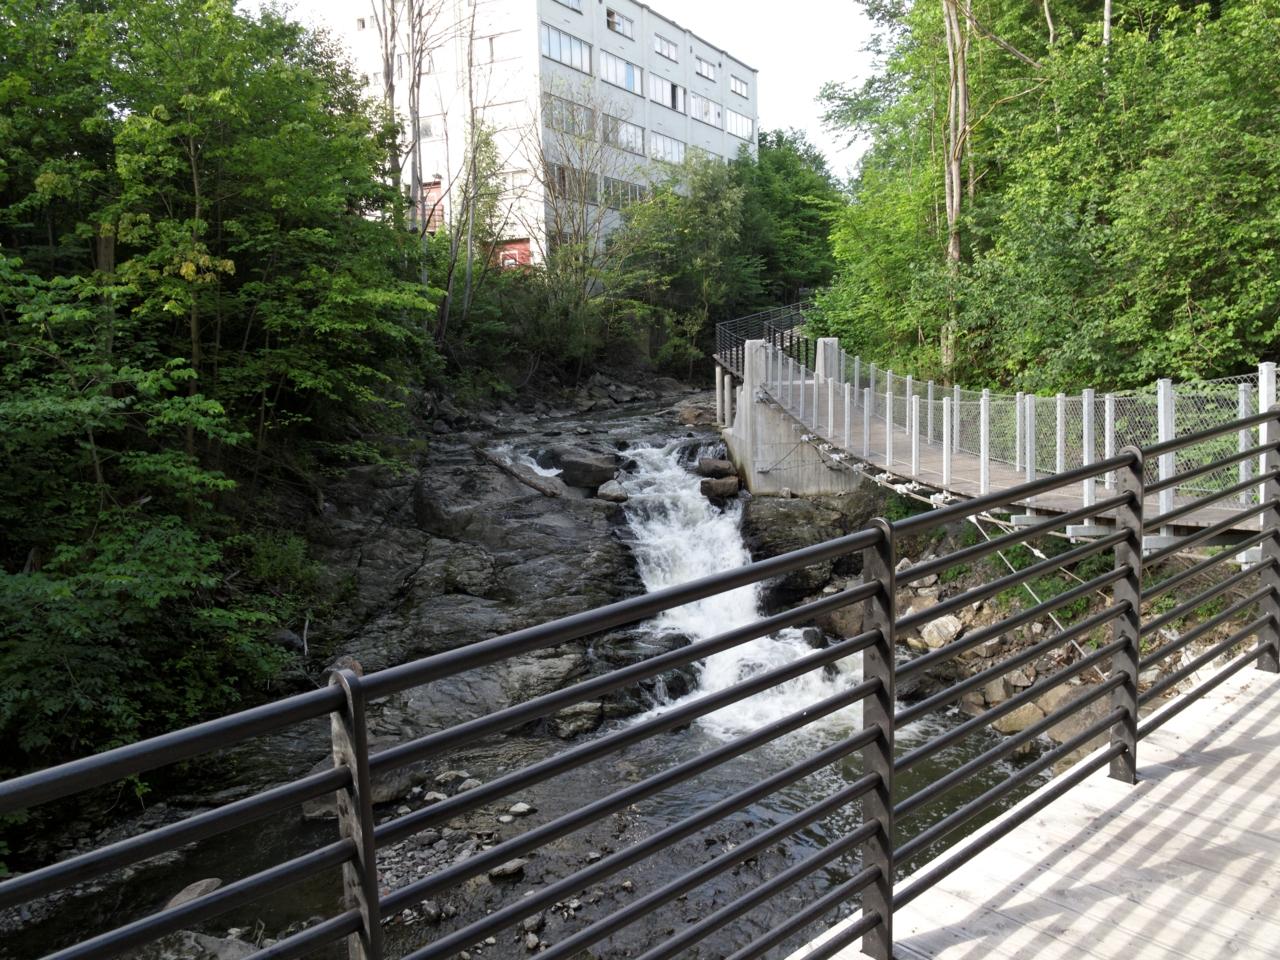 Sykkelruter i Oslo: Bryn til Grønlandsleiret via turvei — en liten perle!